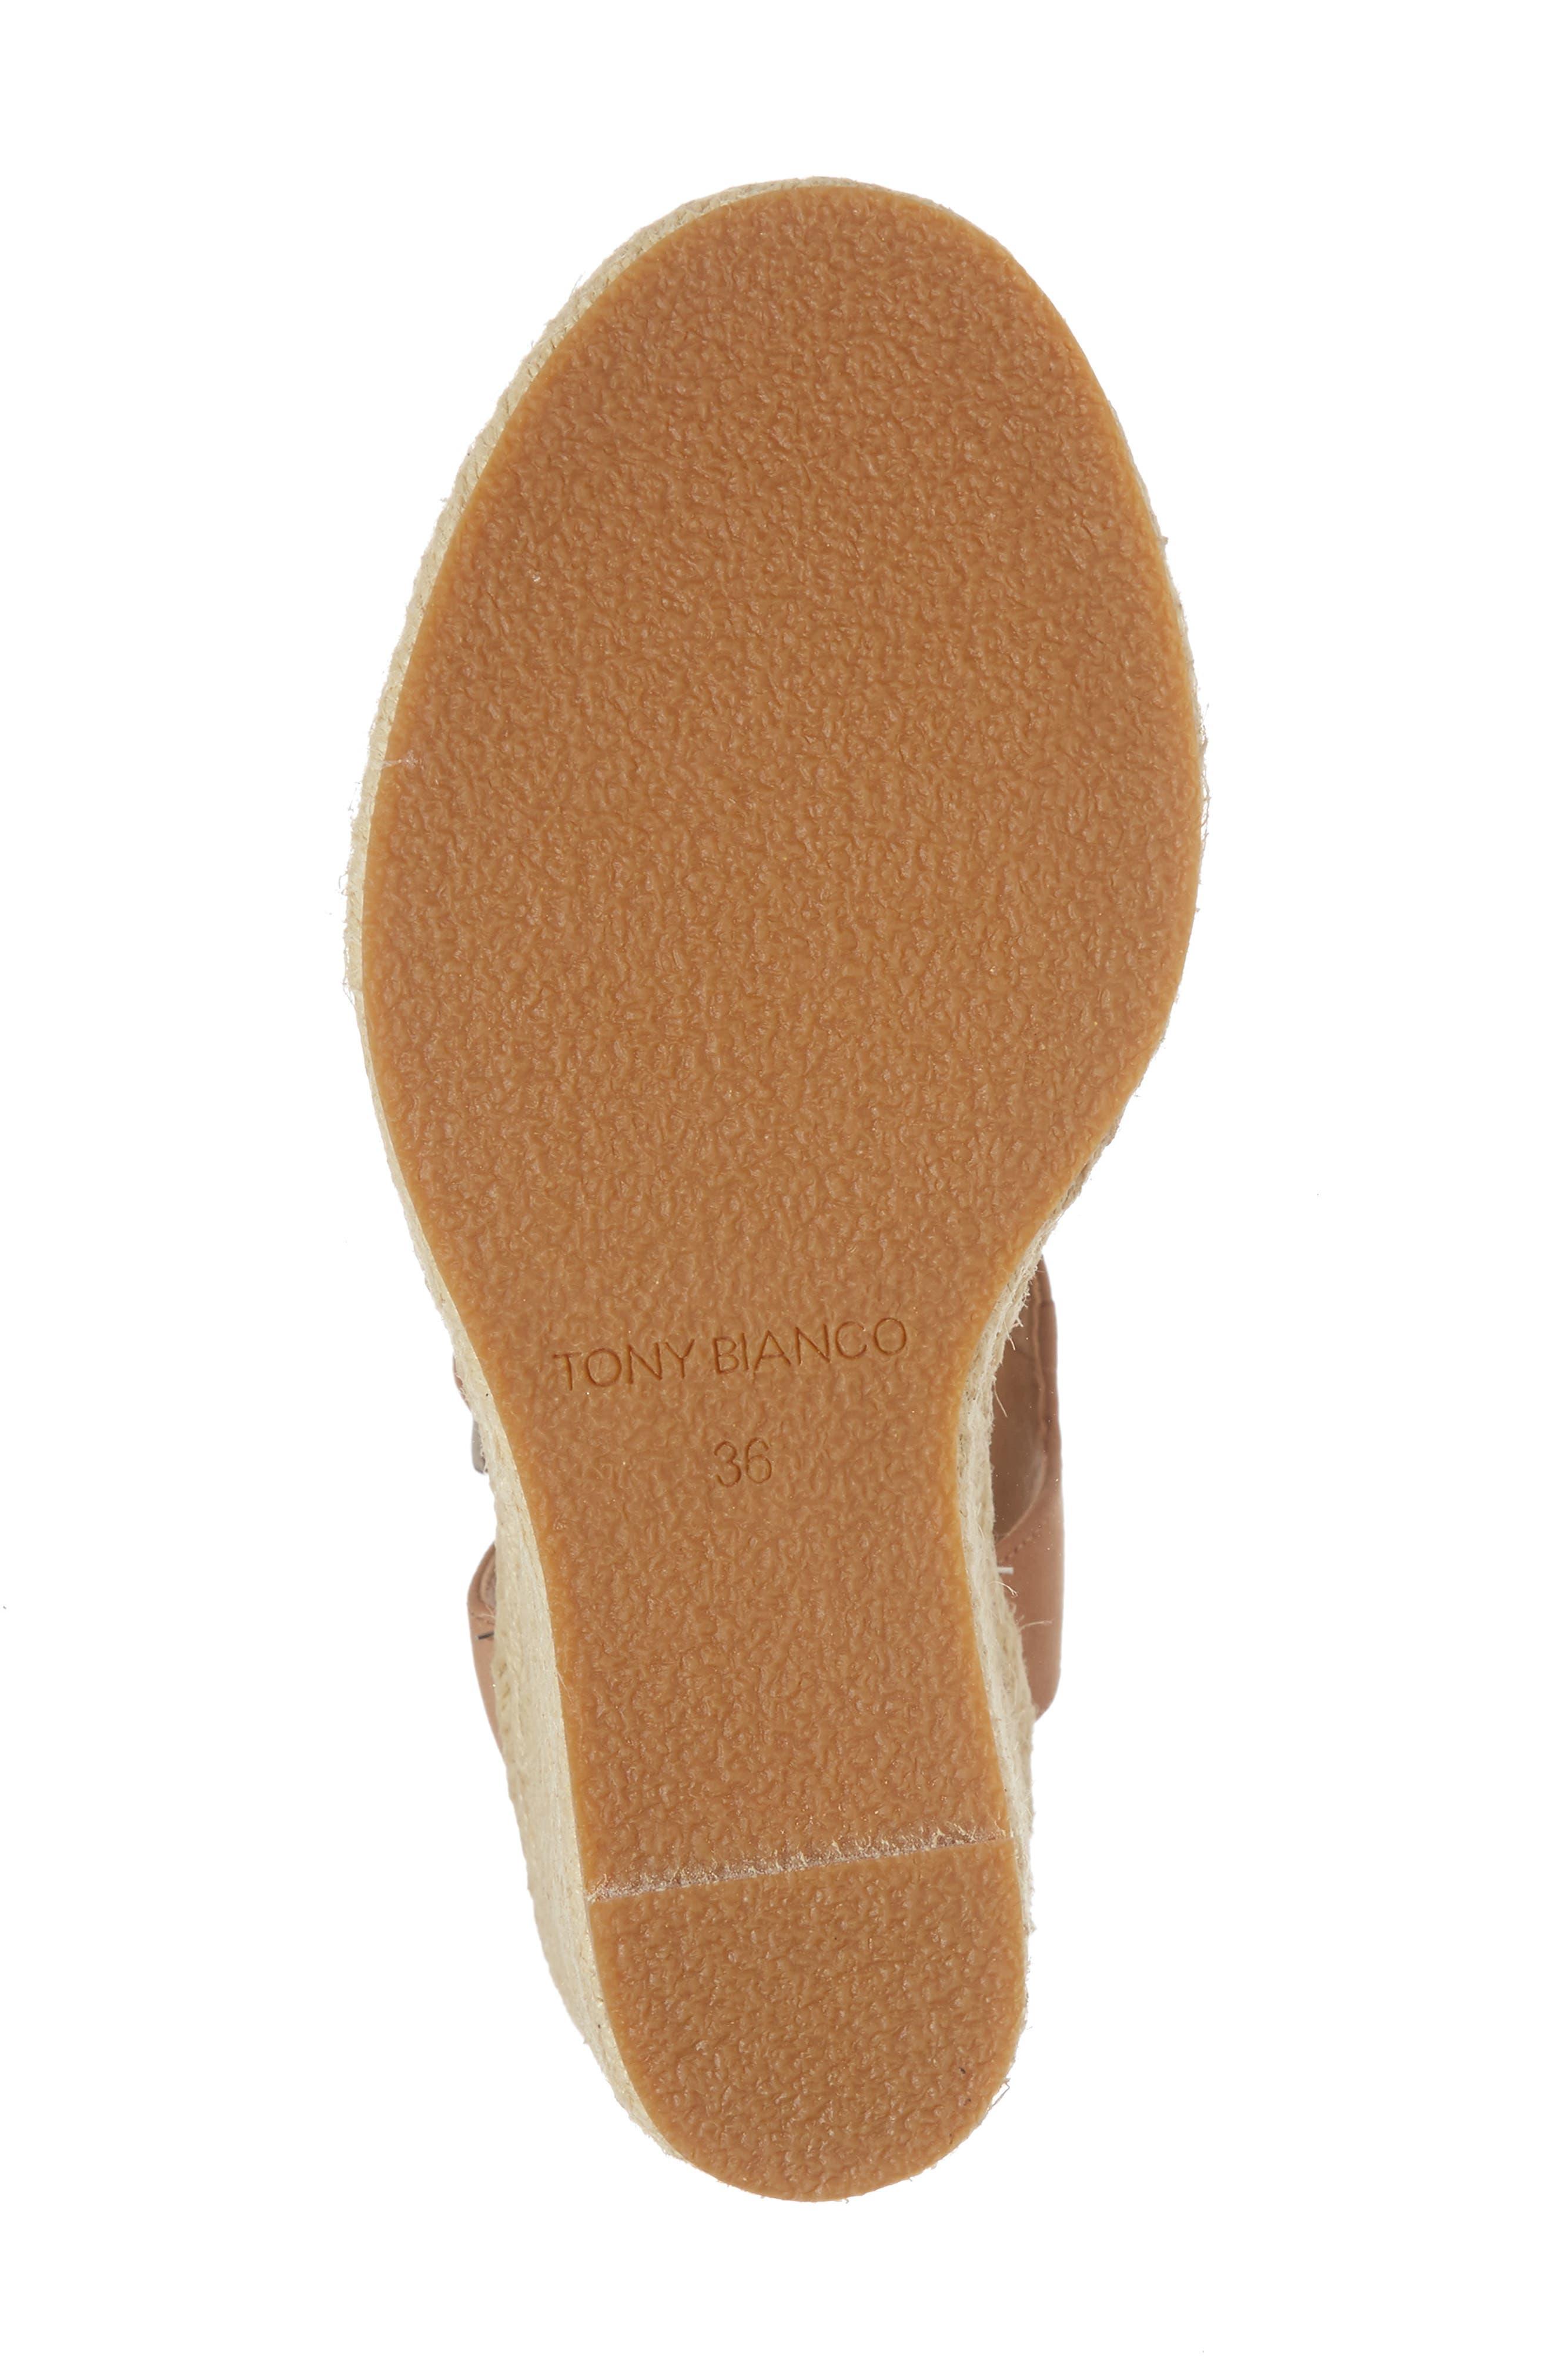 Boston Espadrille Wedge Sandal,                             Alternate thumbnail 6, color,                             Caramel Phoenix Leather